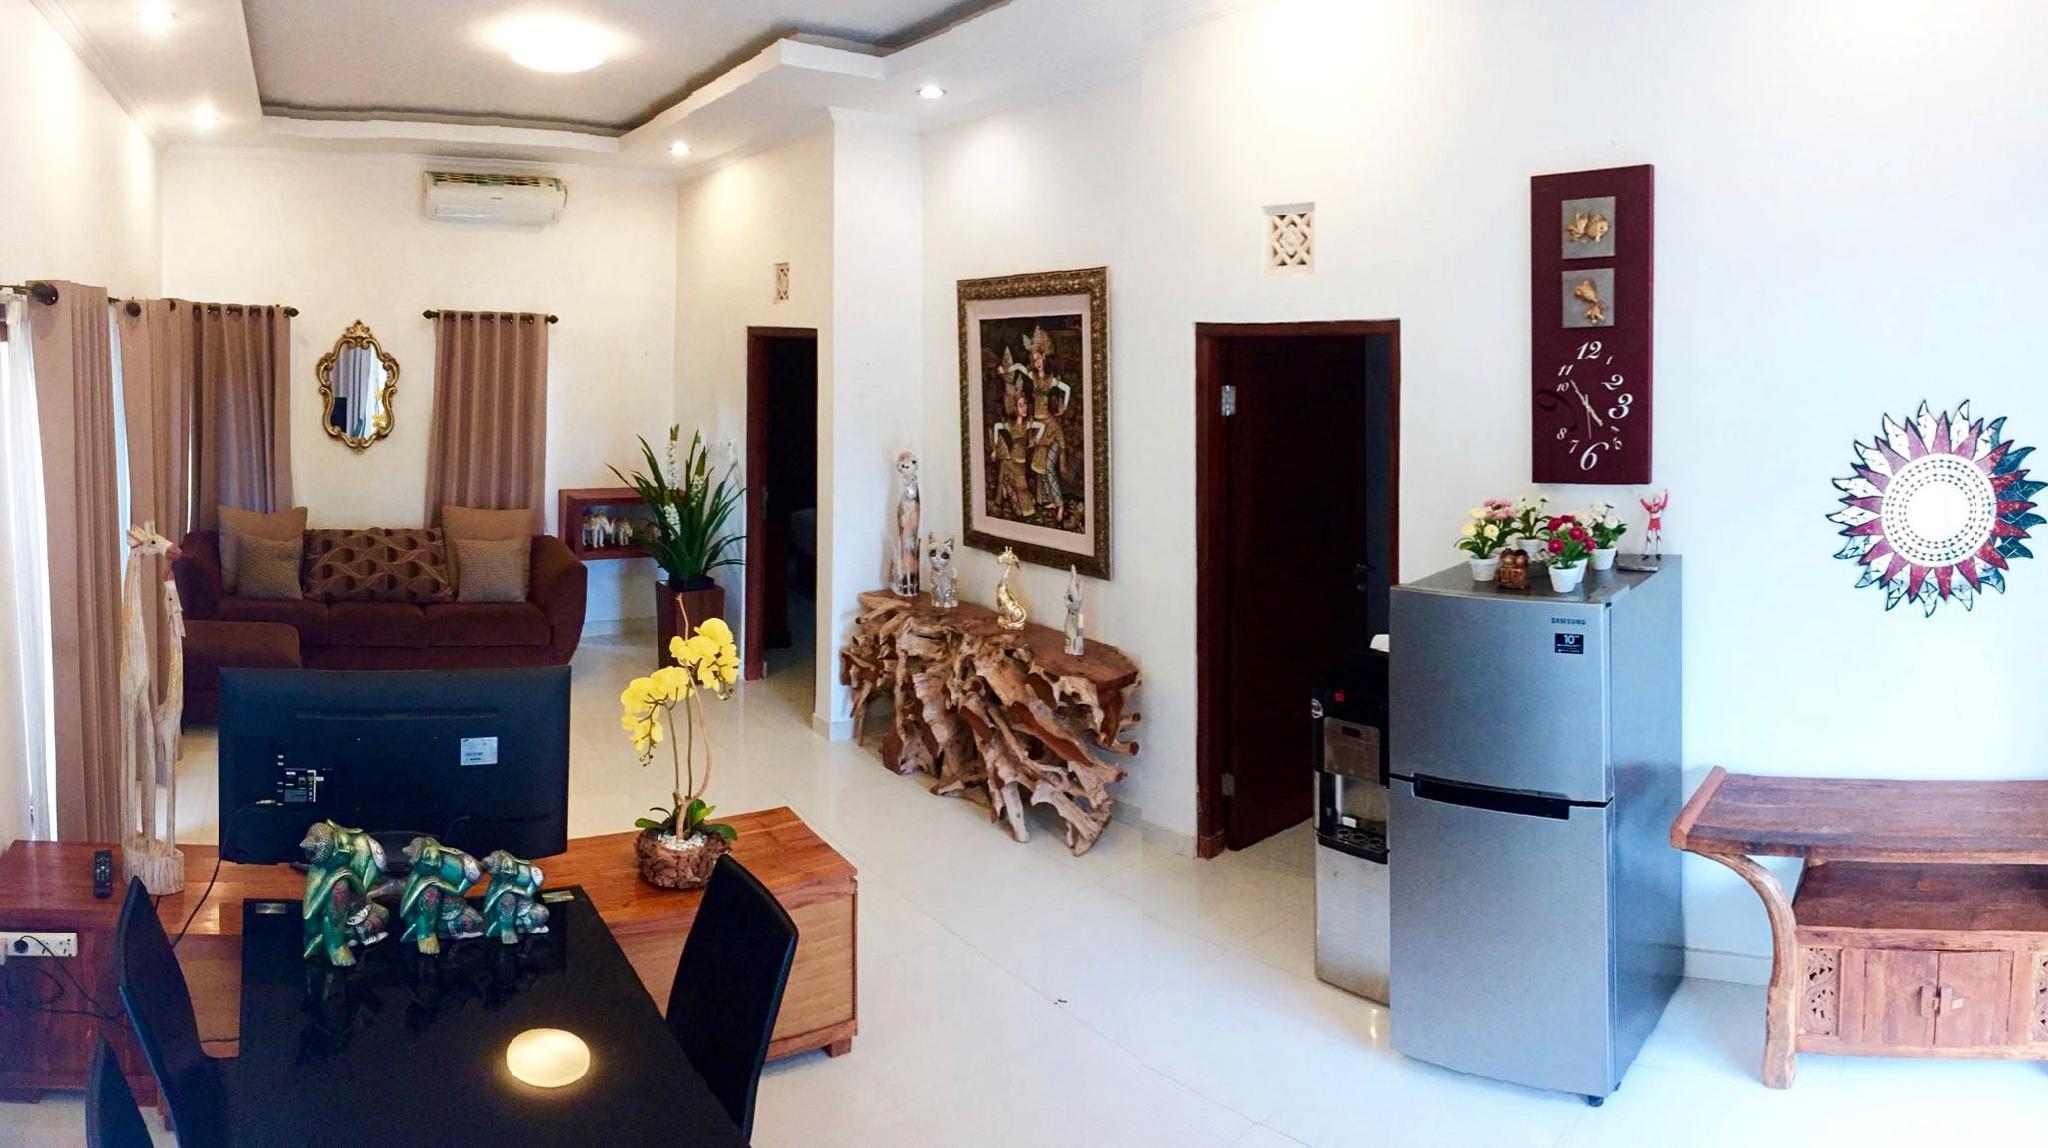 A Cozy And Comfortable 2 BR Villa In South Kuta Bali